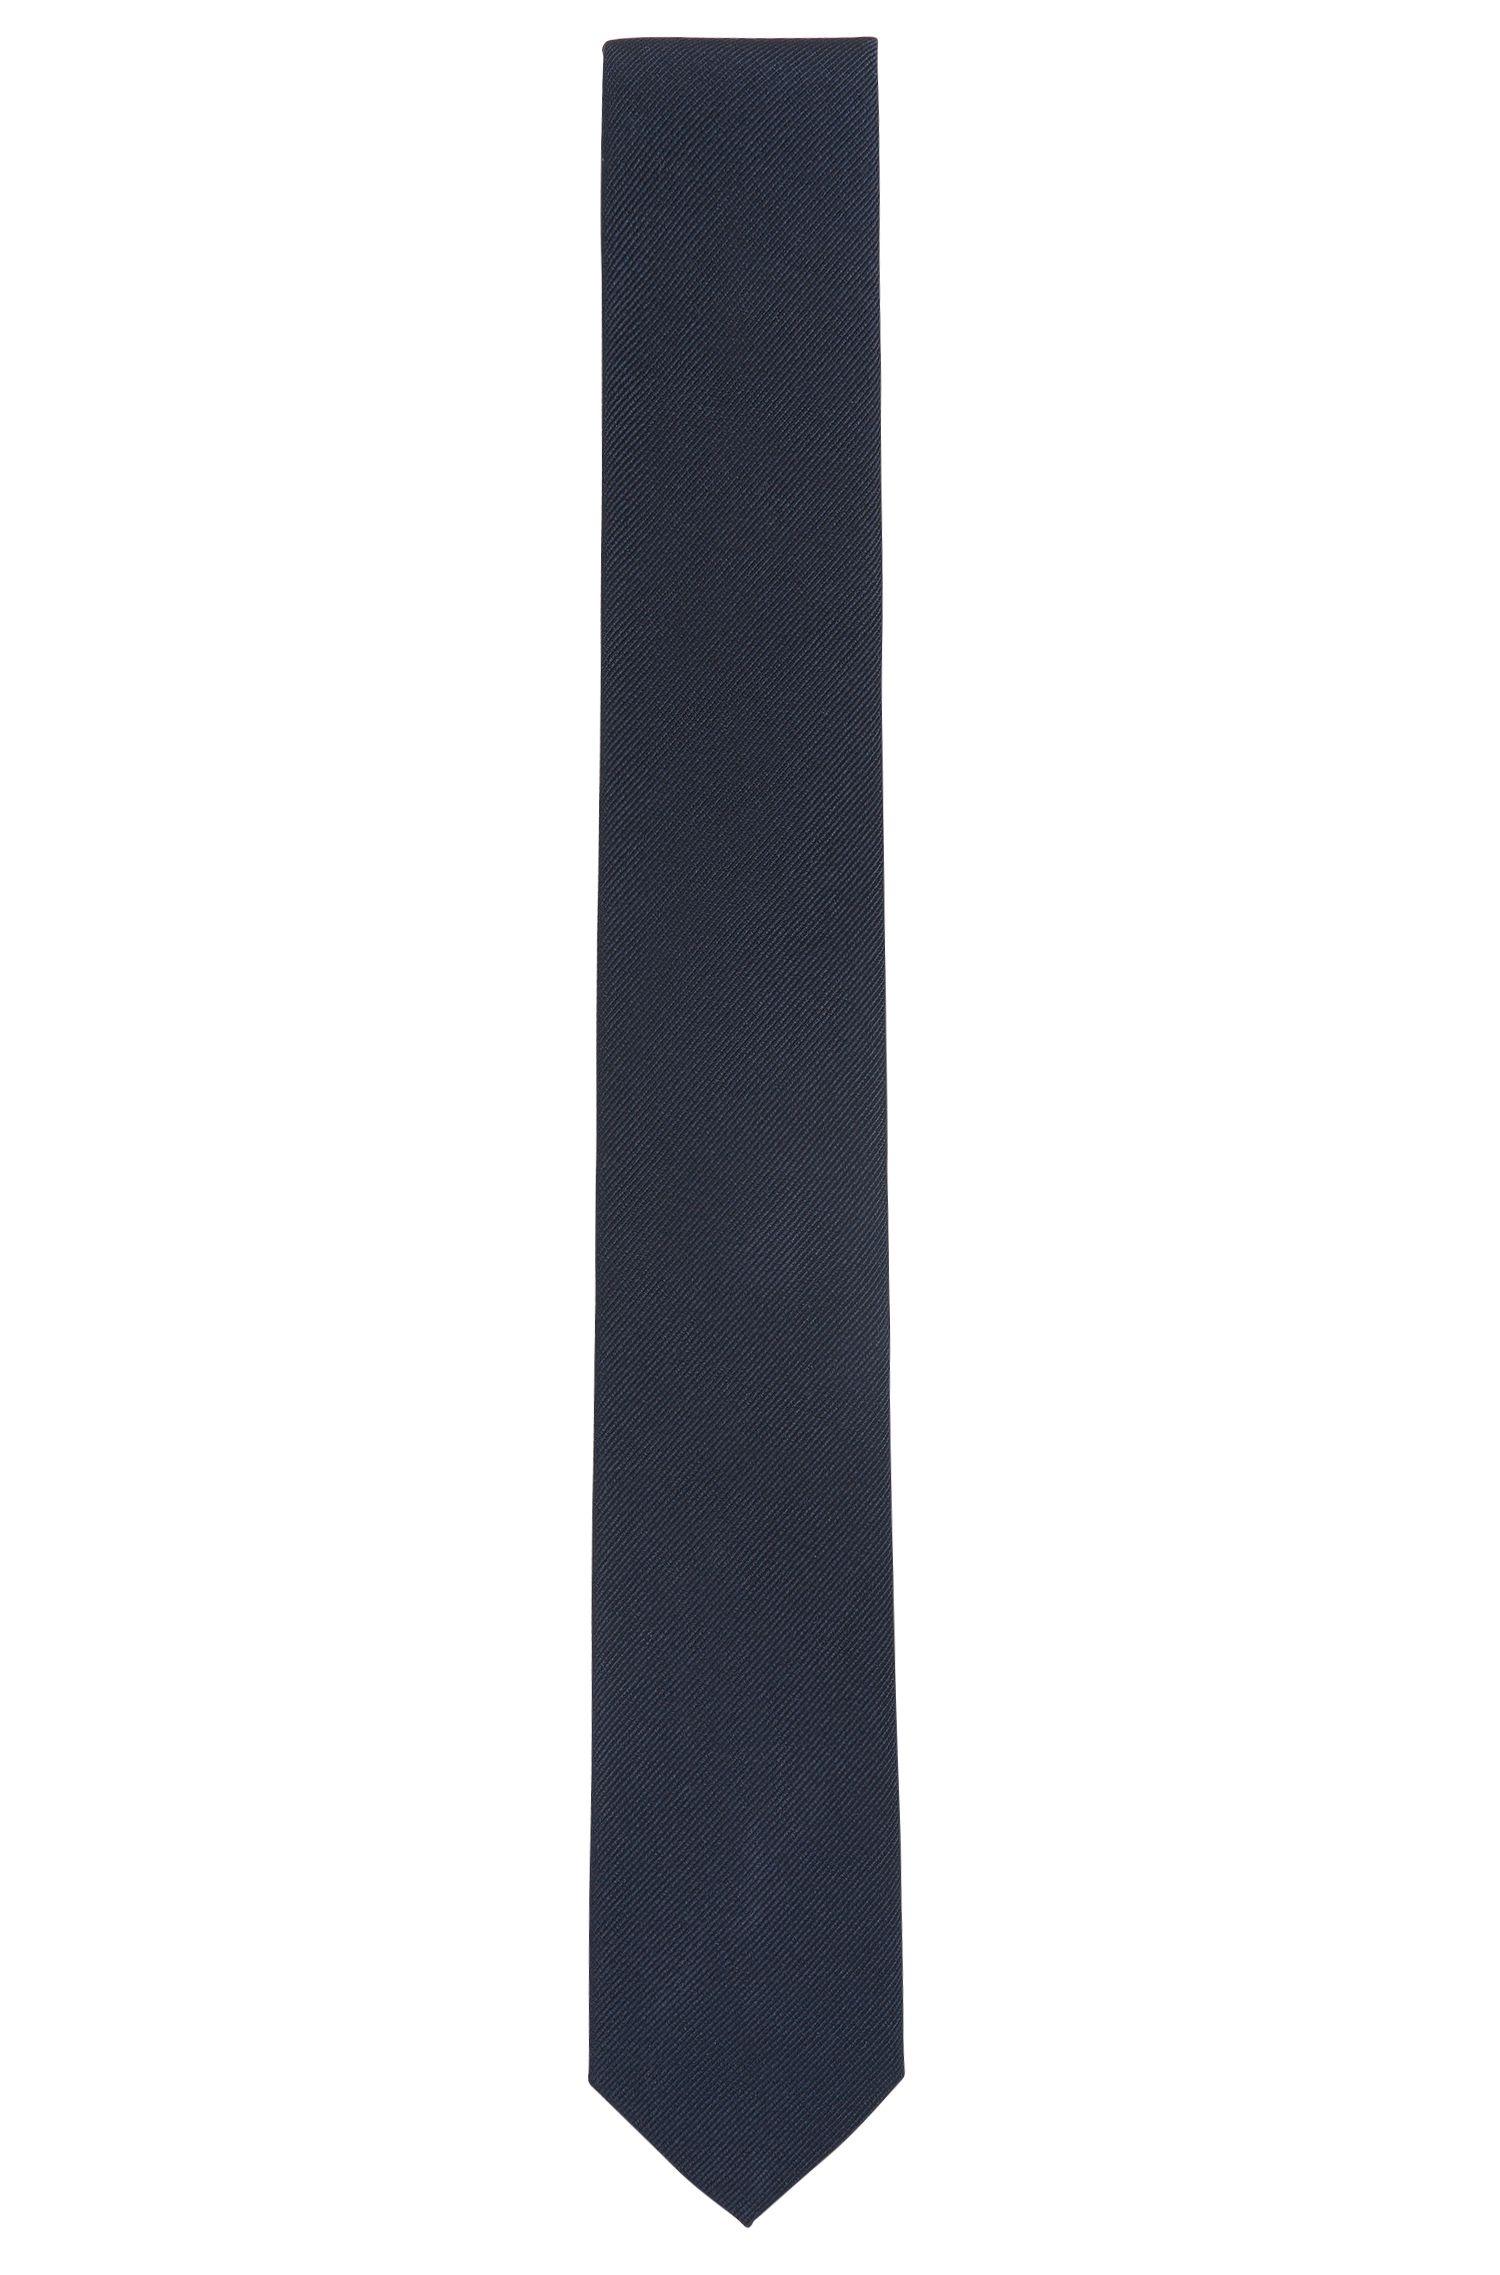 'Tie 6 cm' | Slim, Silk Twill Tie